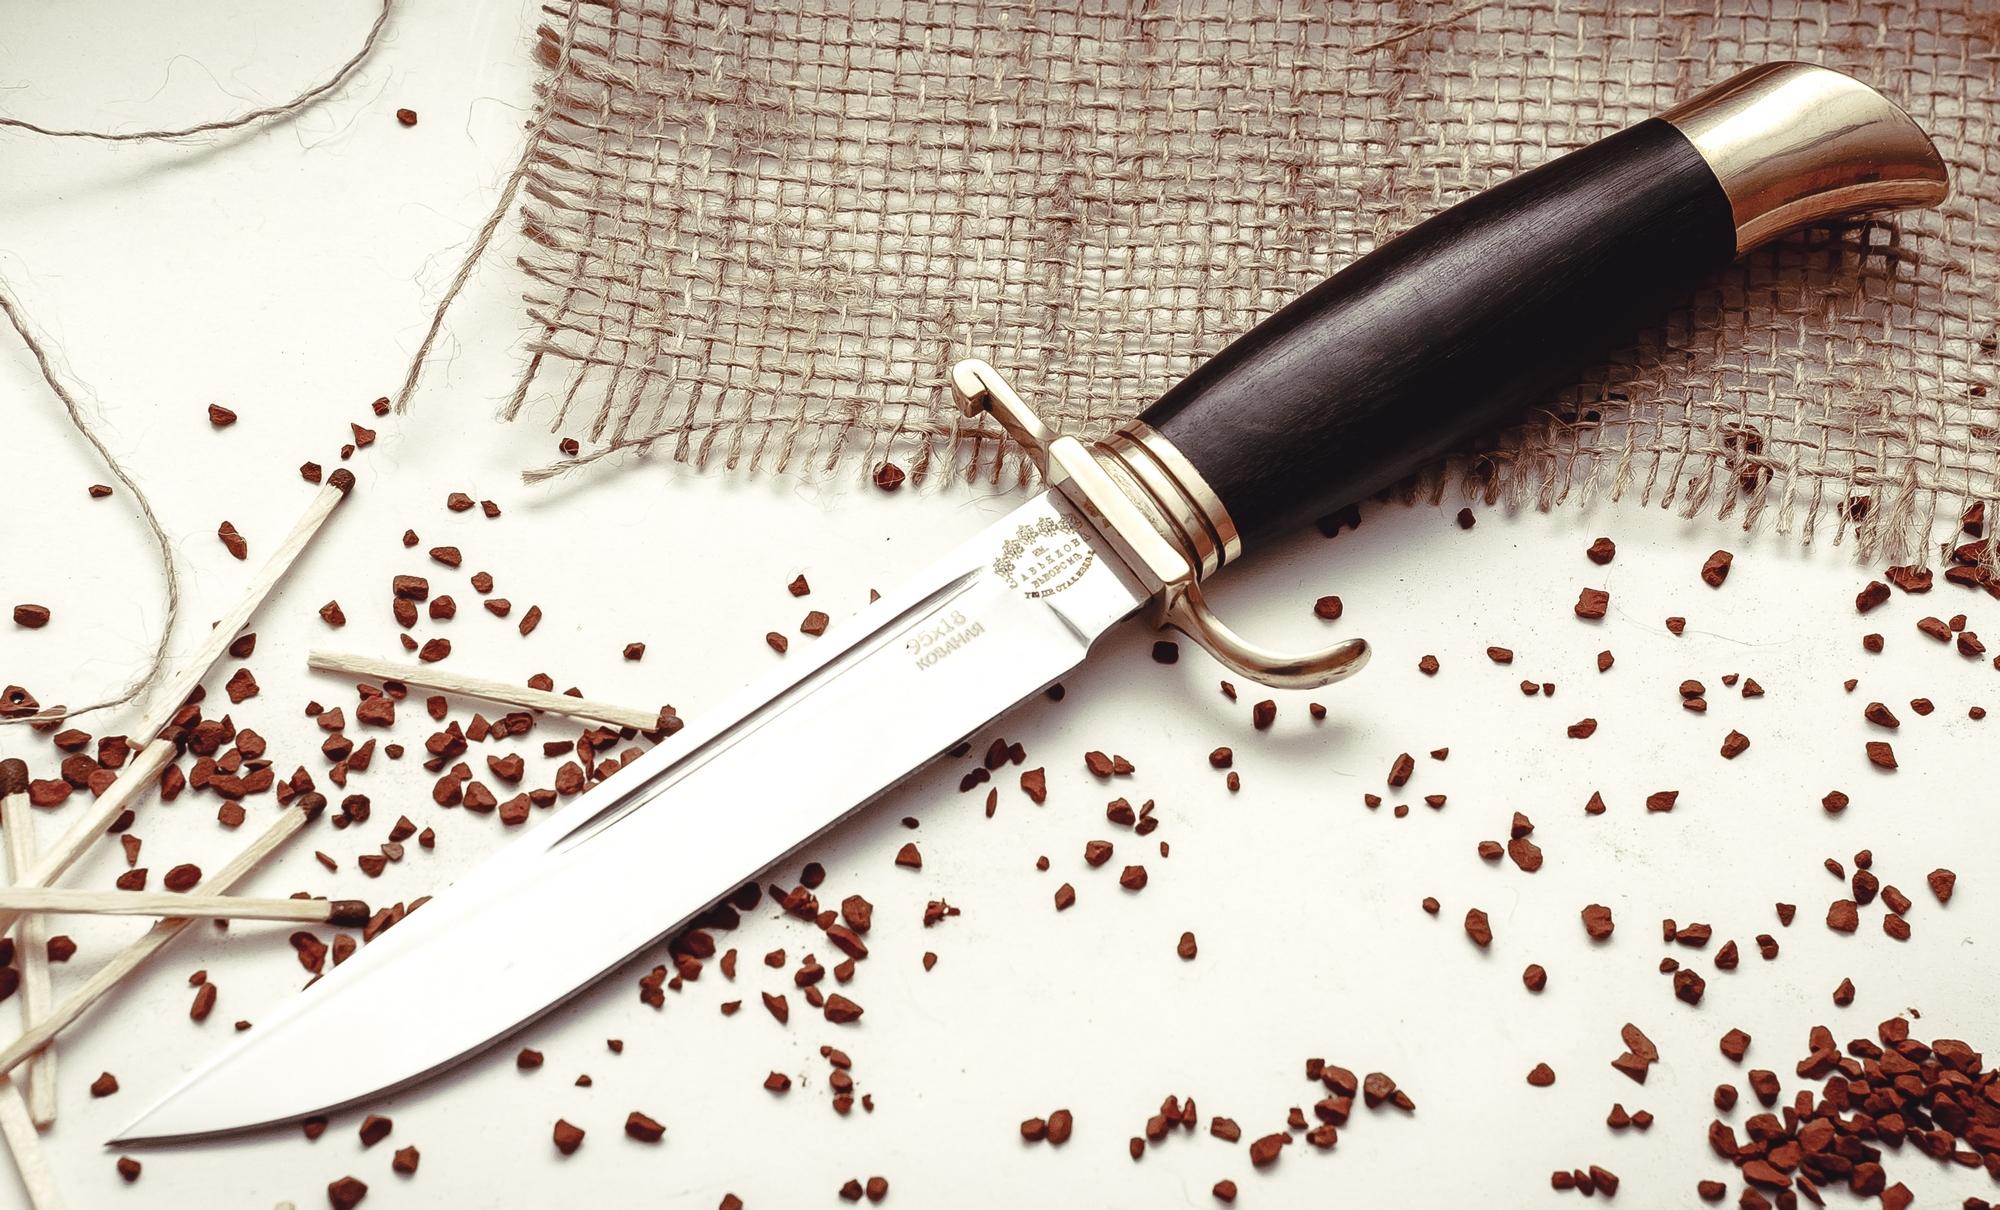 Фото 5 - Нож Финка НКВД, ков. 95х18, латунь от Кузница Завьялова